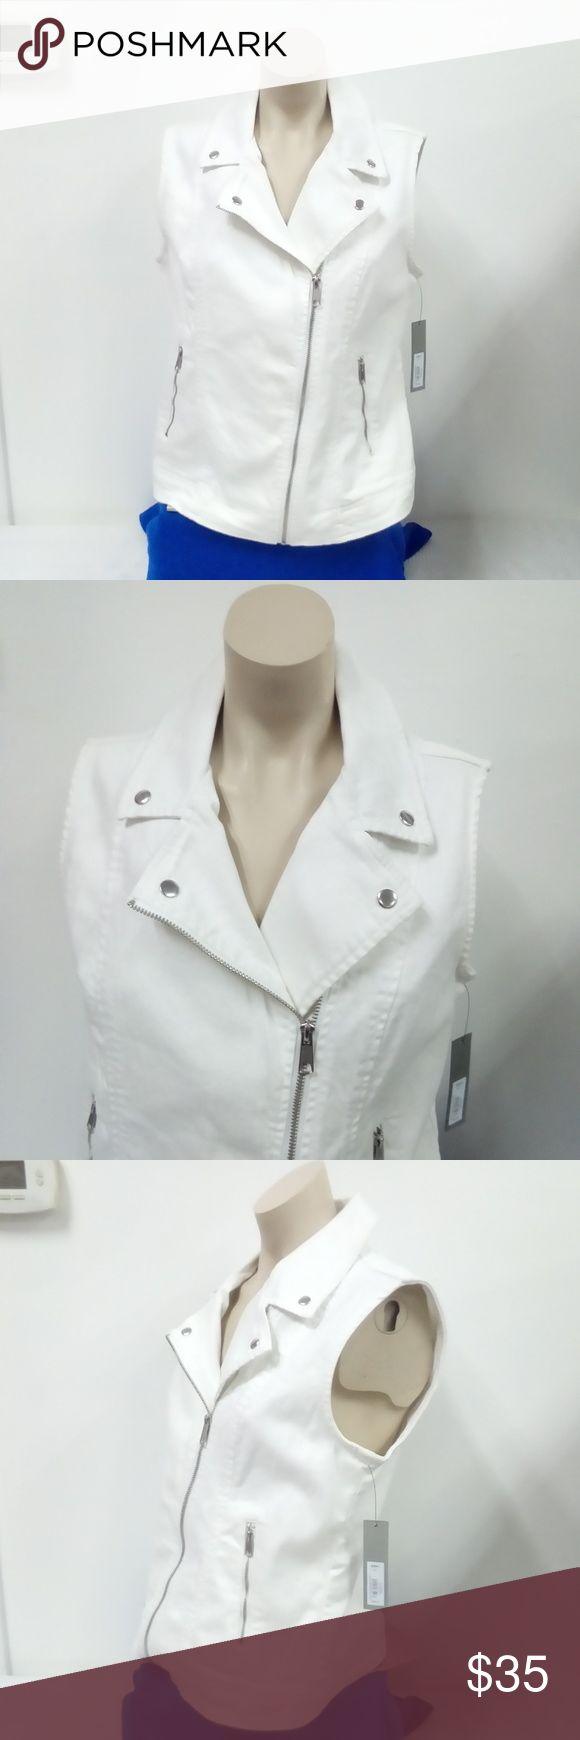 NWT Apt. 9 White Denim Vest Sz. L New and never worn. Front zip closure. Made of white denim. Apt.9 Jackets & Coats Vests